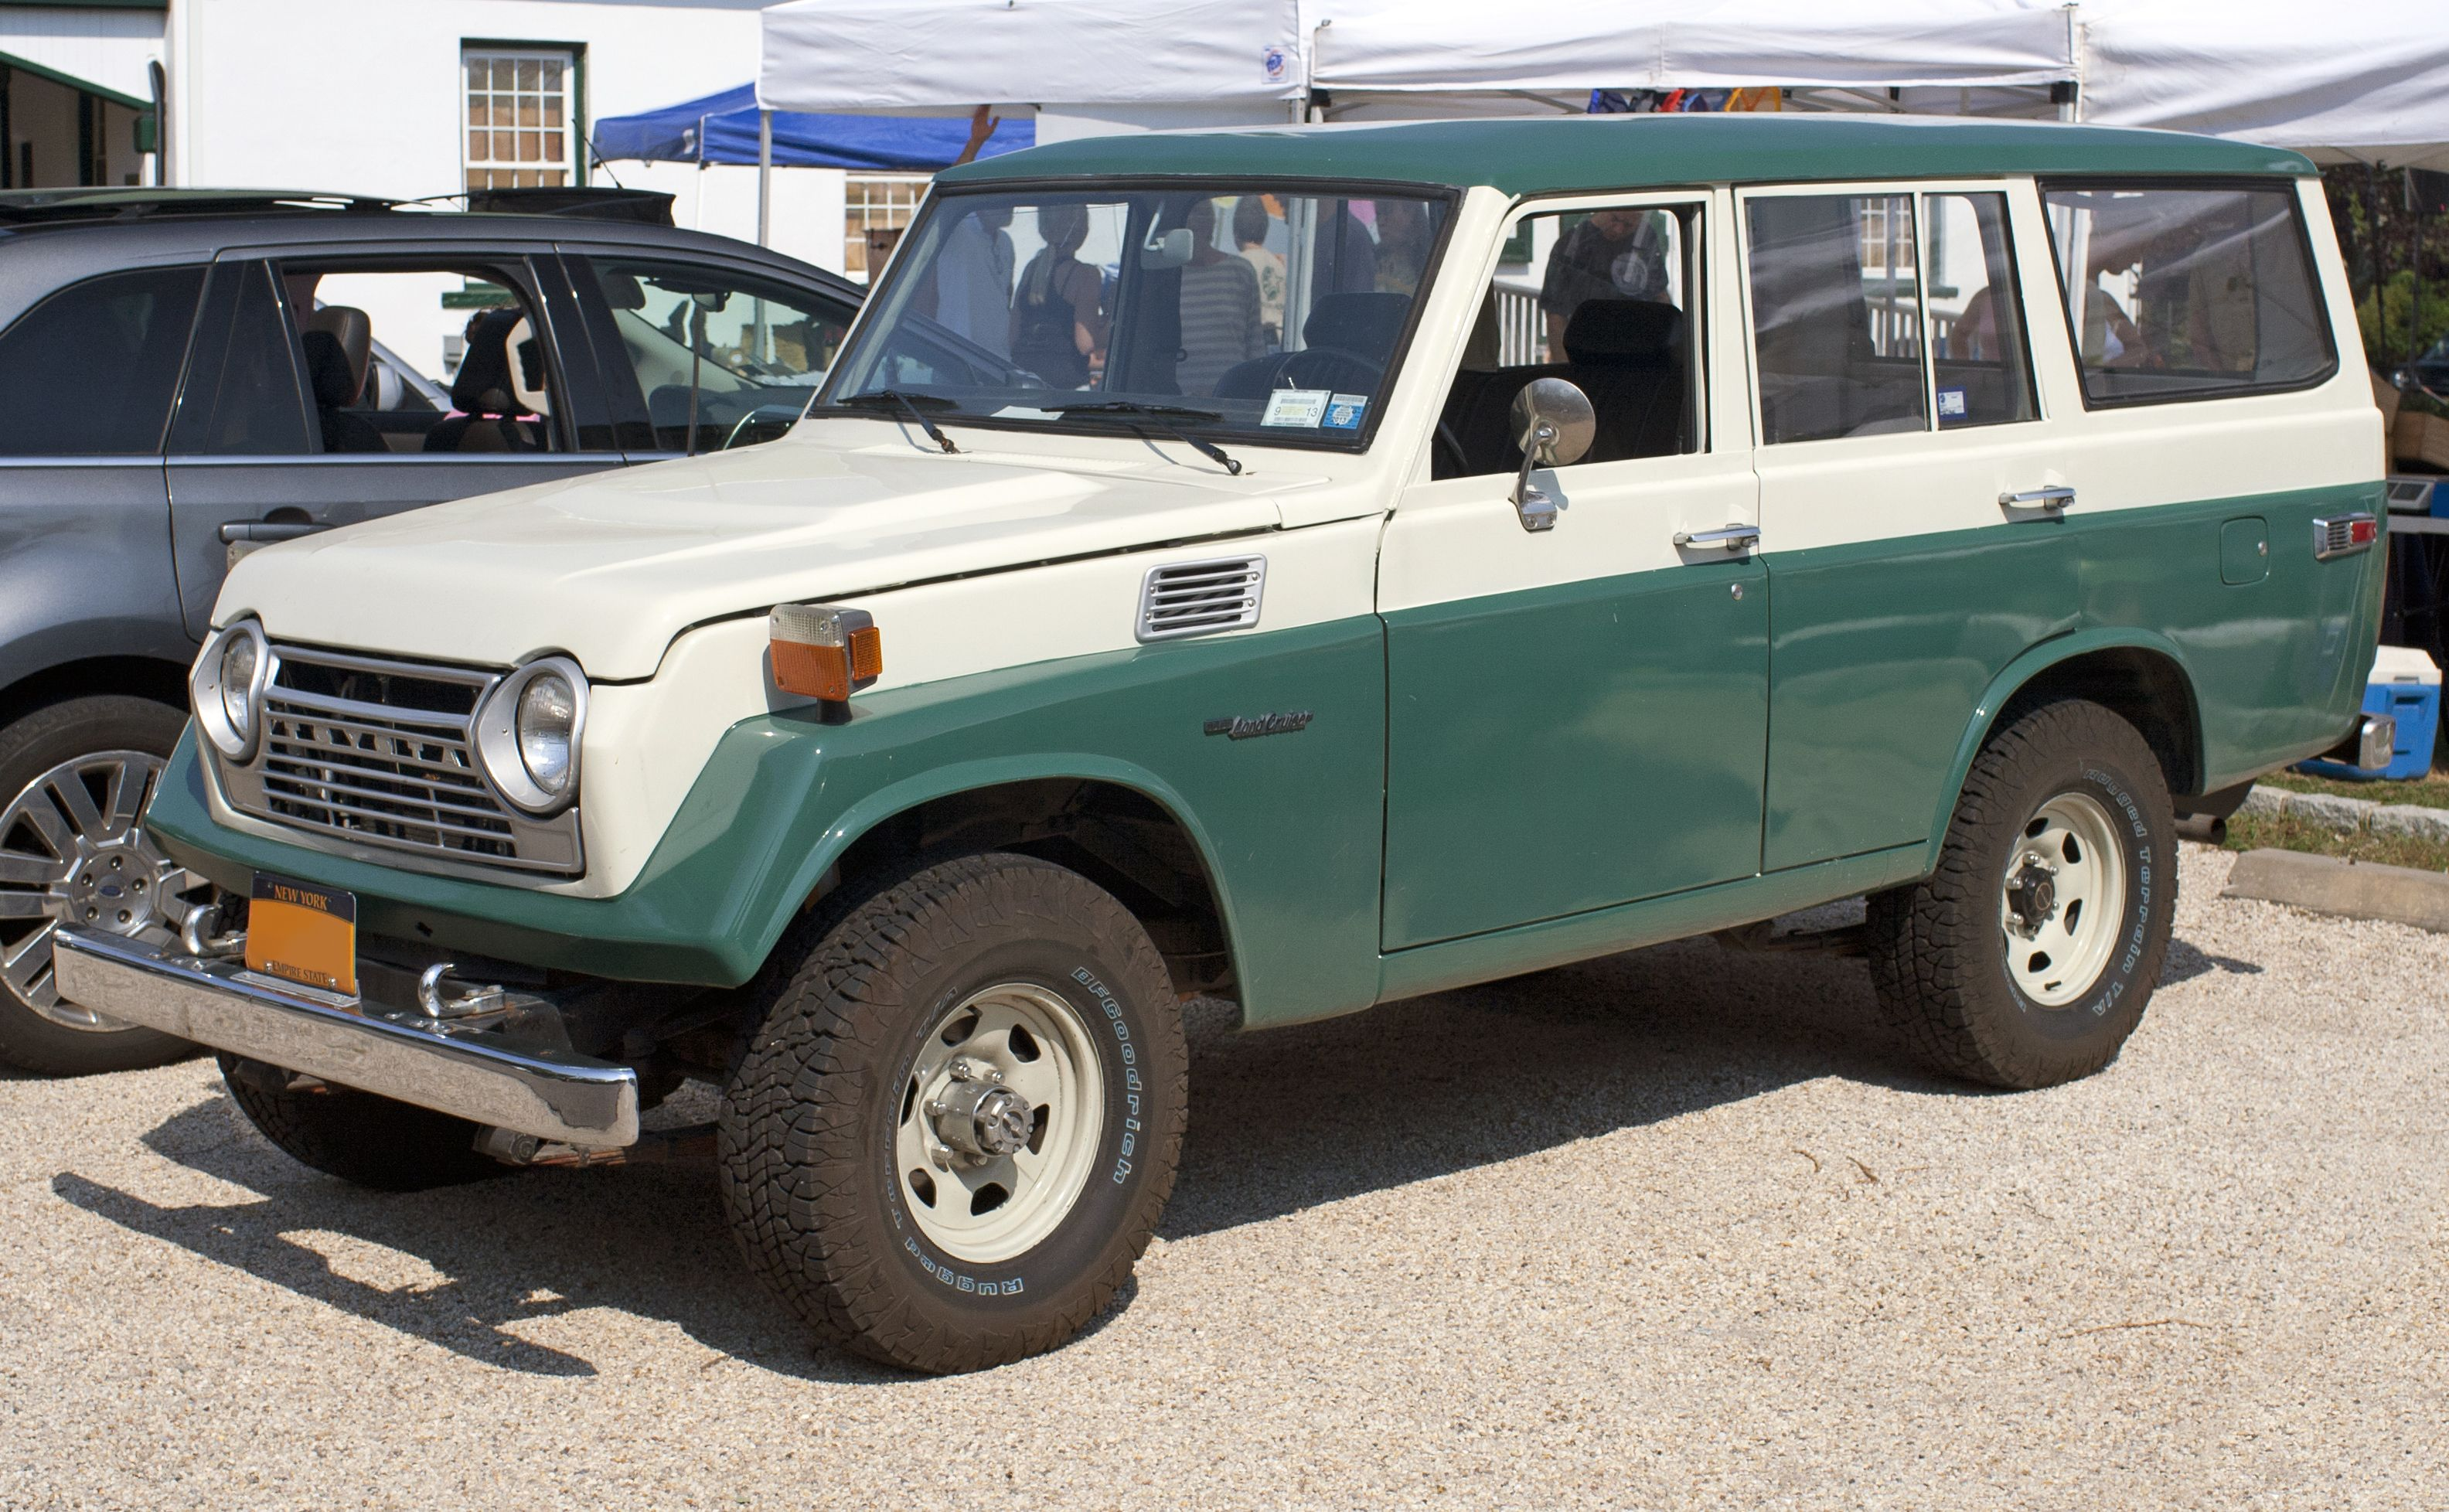 Toyota land cruiser archivo 1979 toyota land cruiser fj55 jpg wikipedia